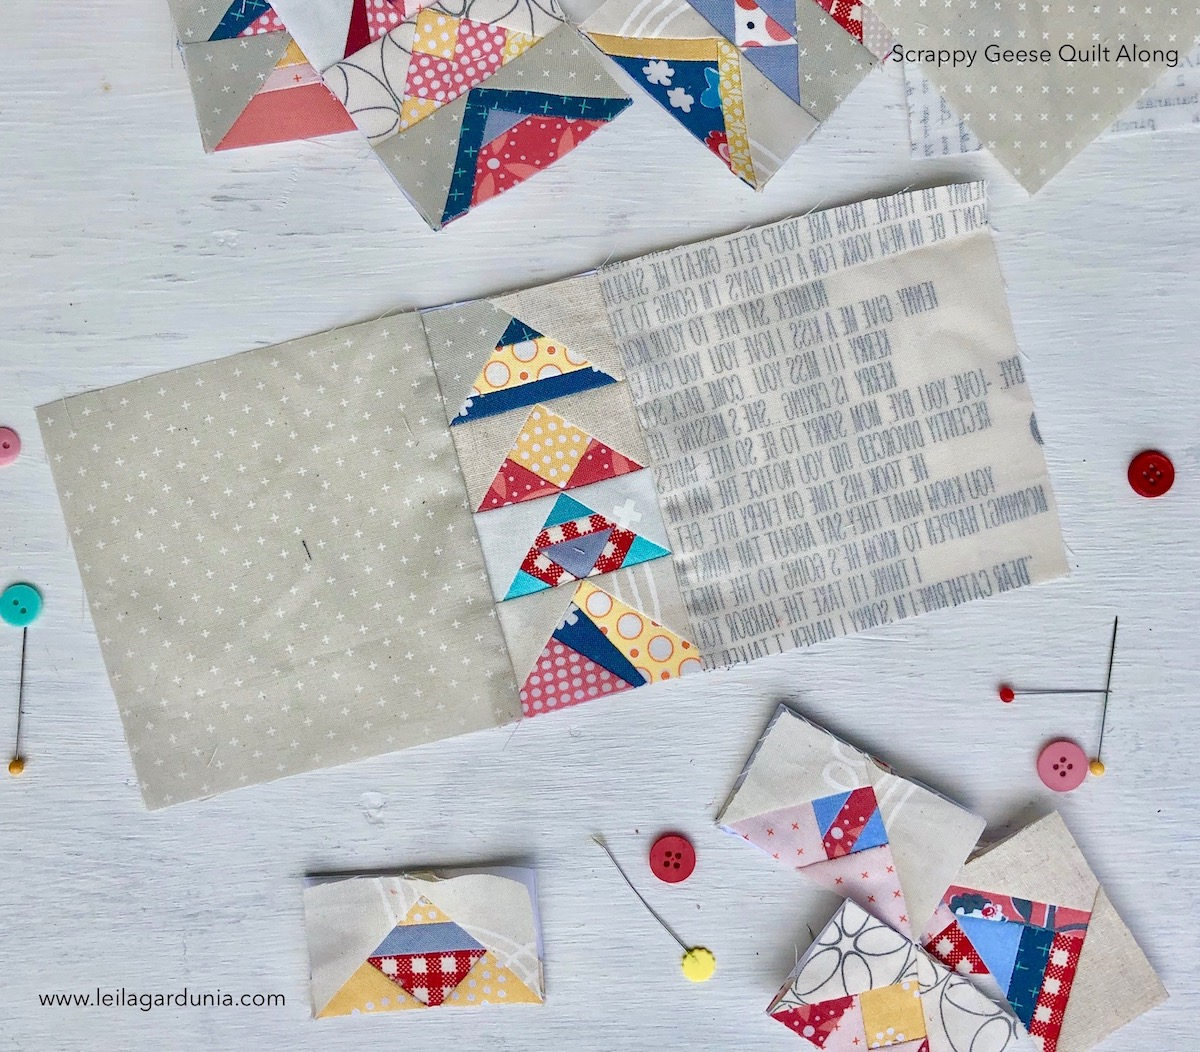 1 x 2 scrappy geese quilt along block.jpg